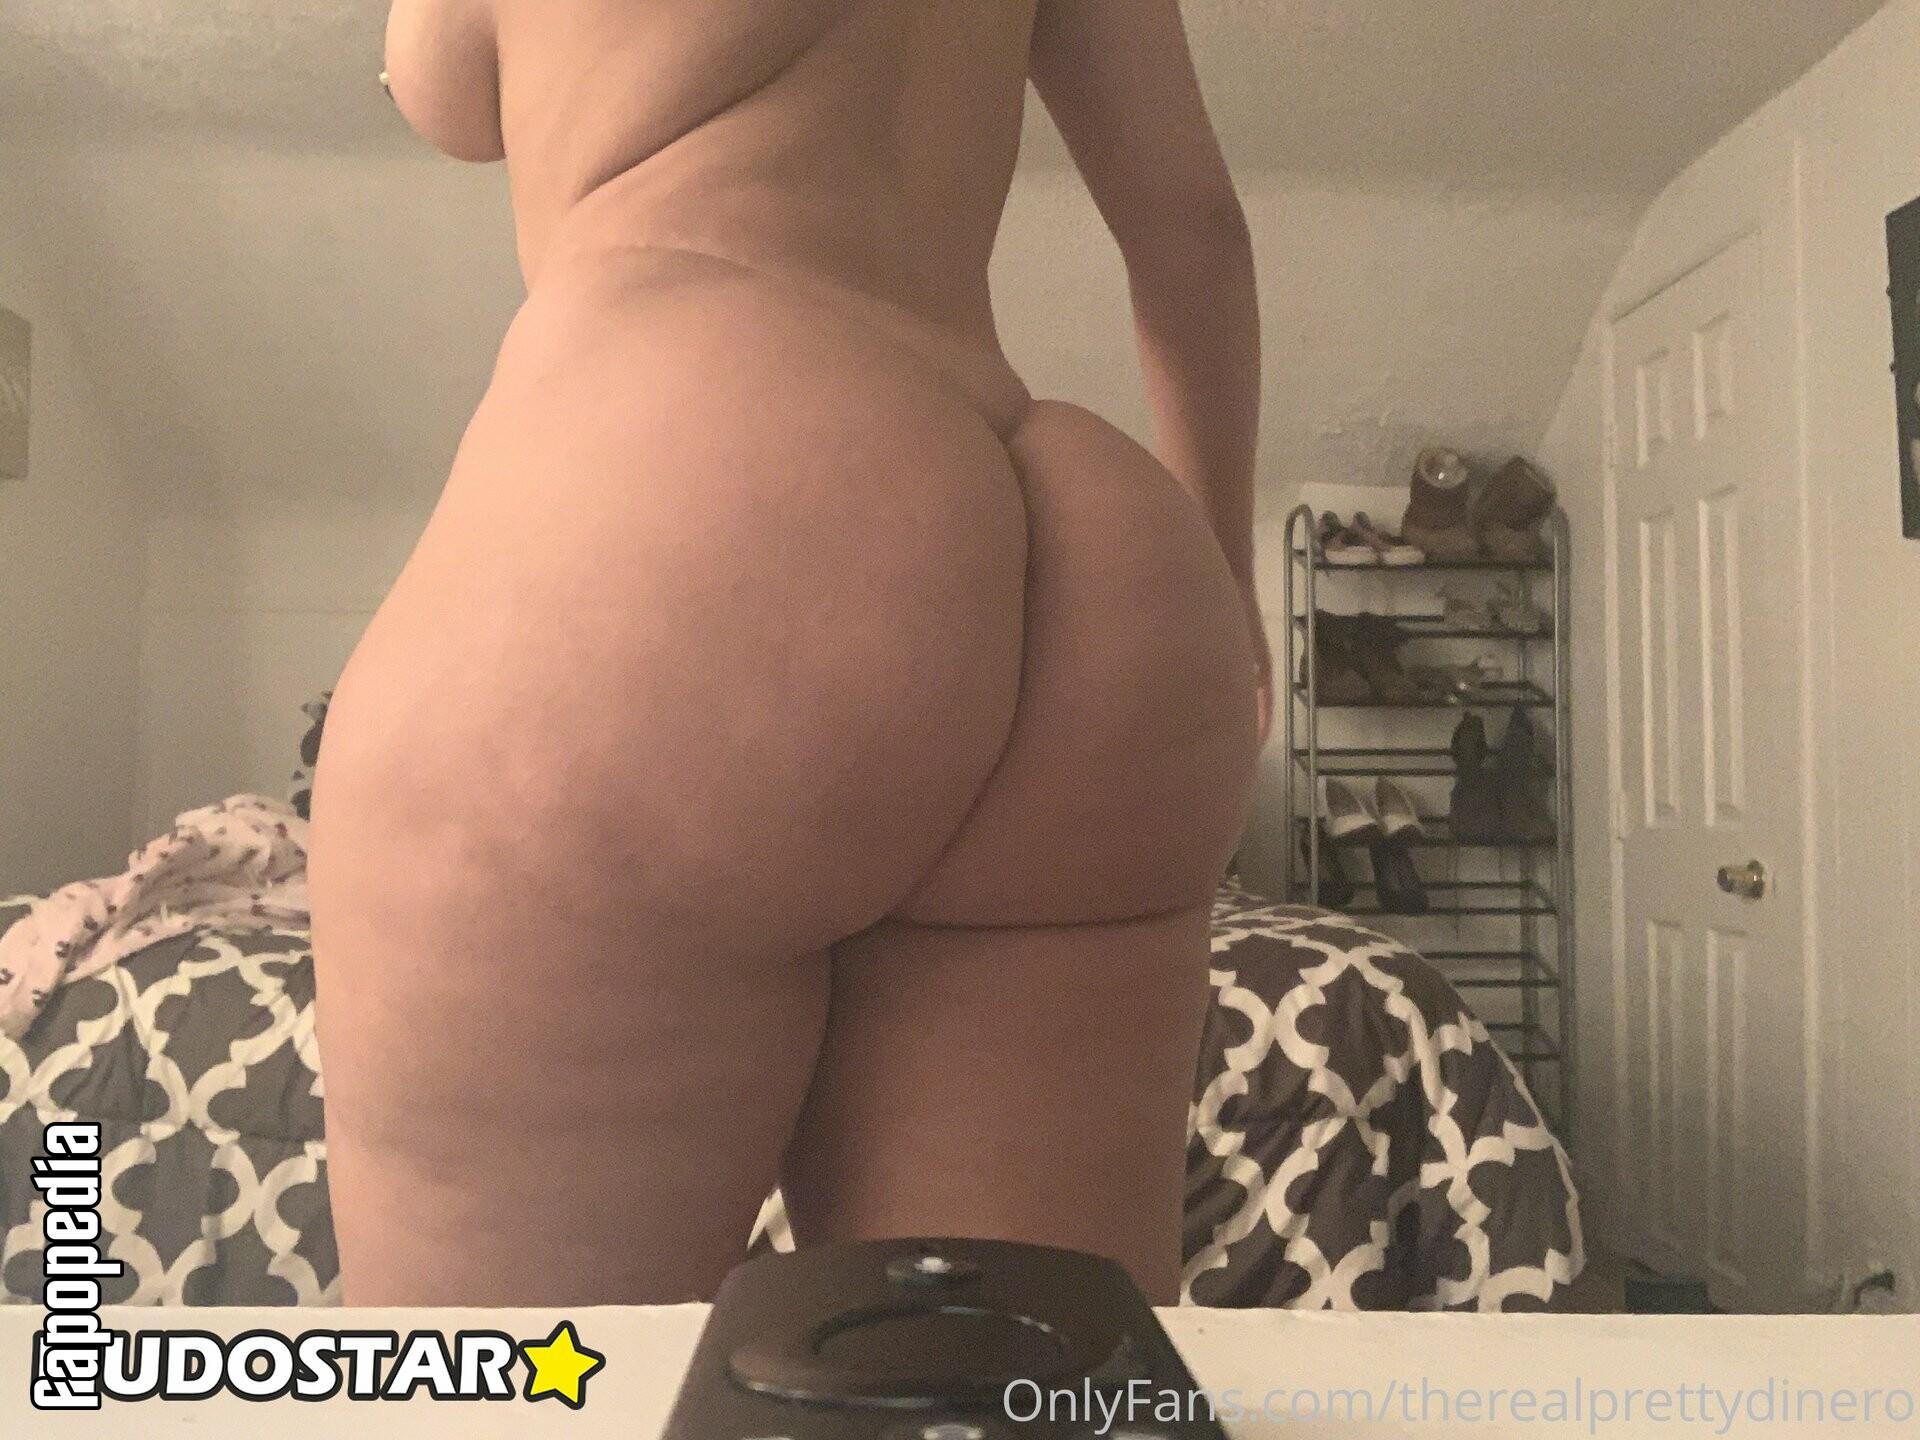 DanaHammofficial Nude OnlyFans Leaks